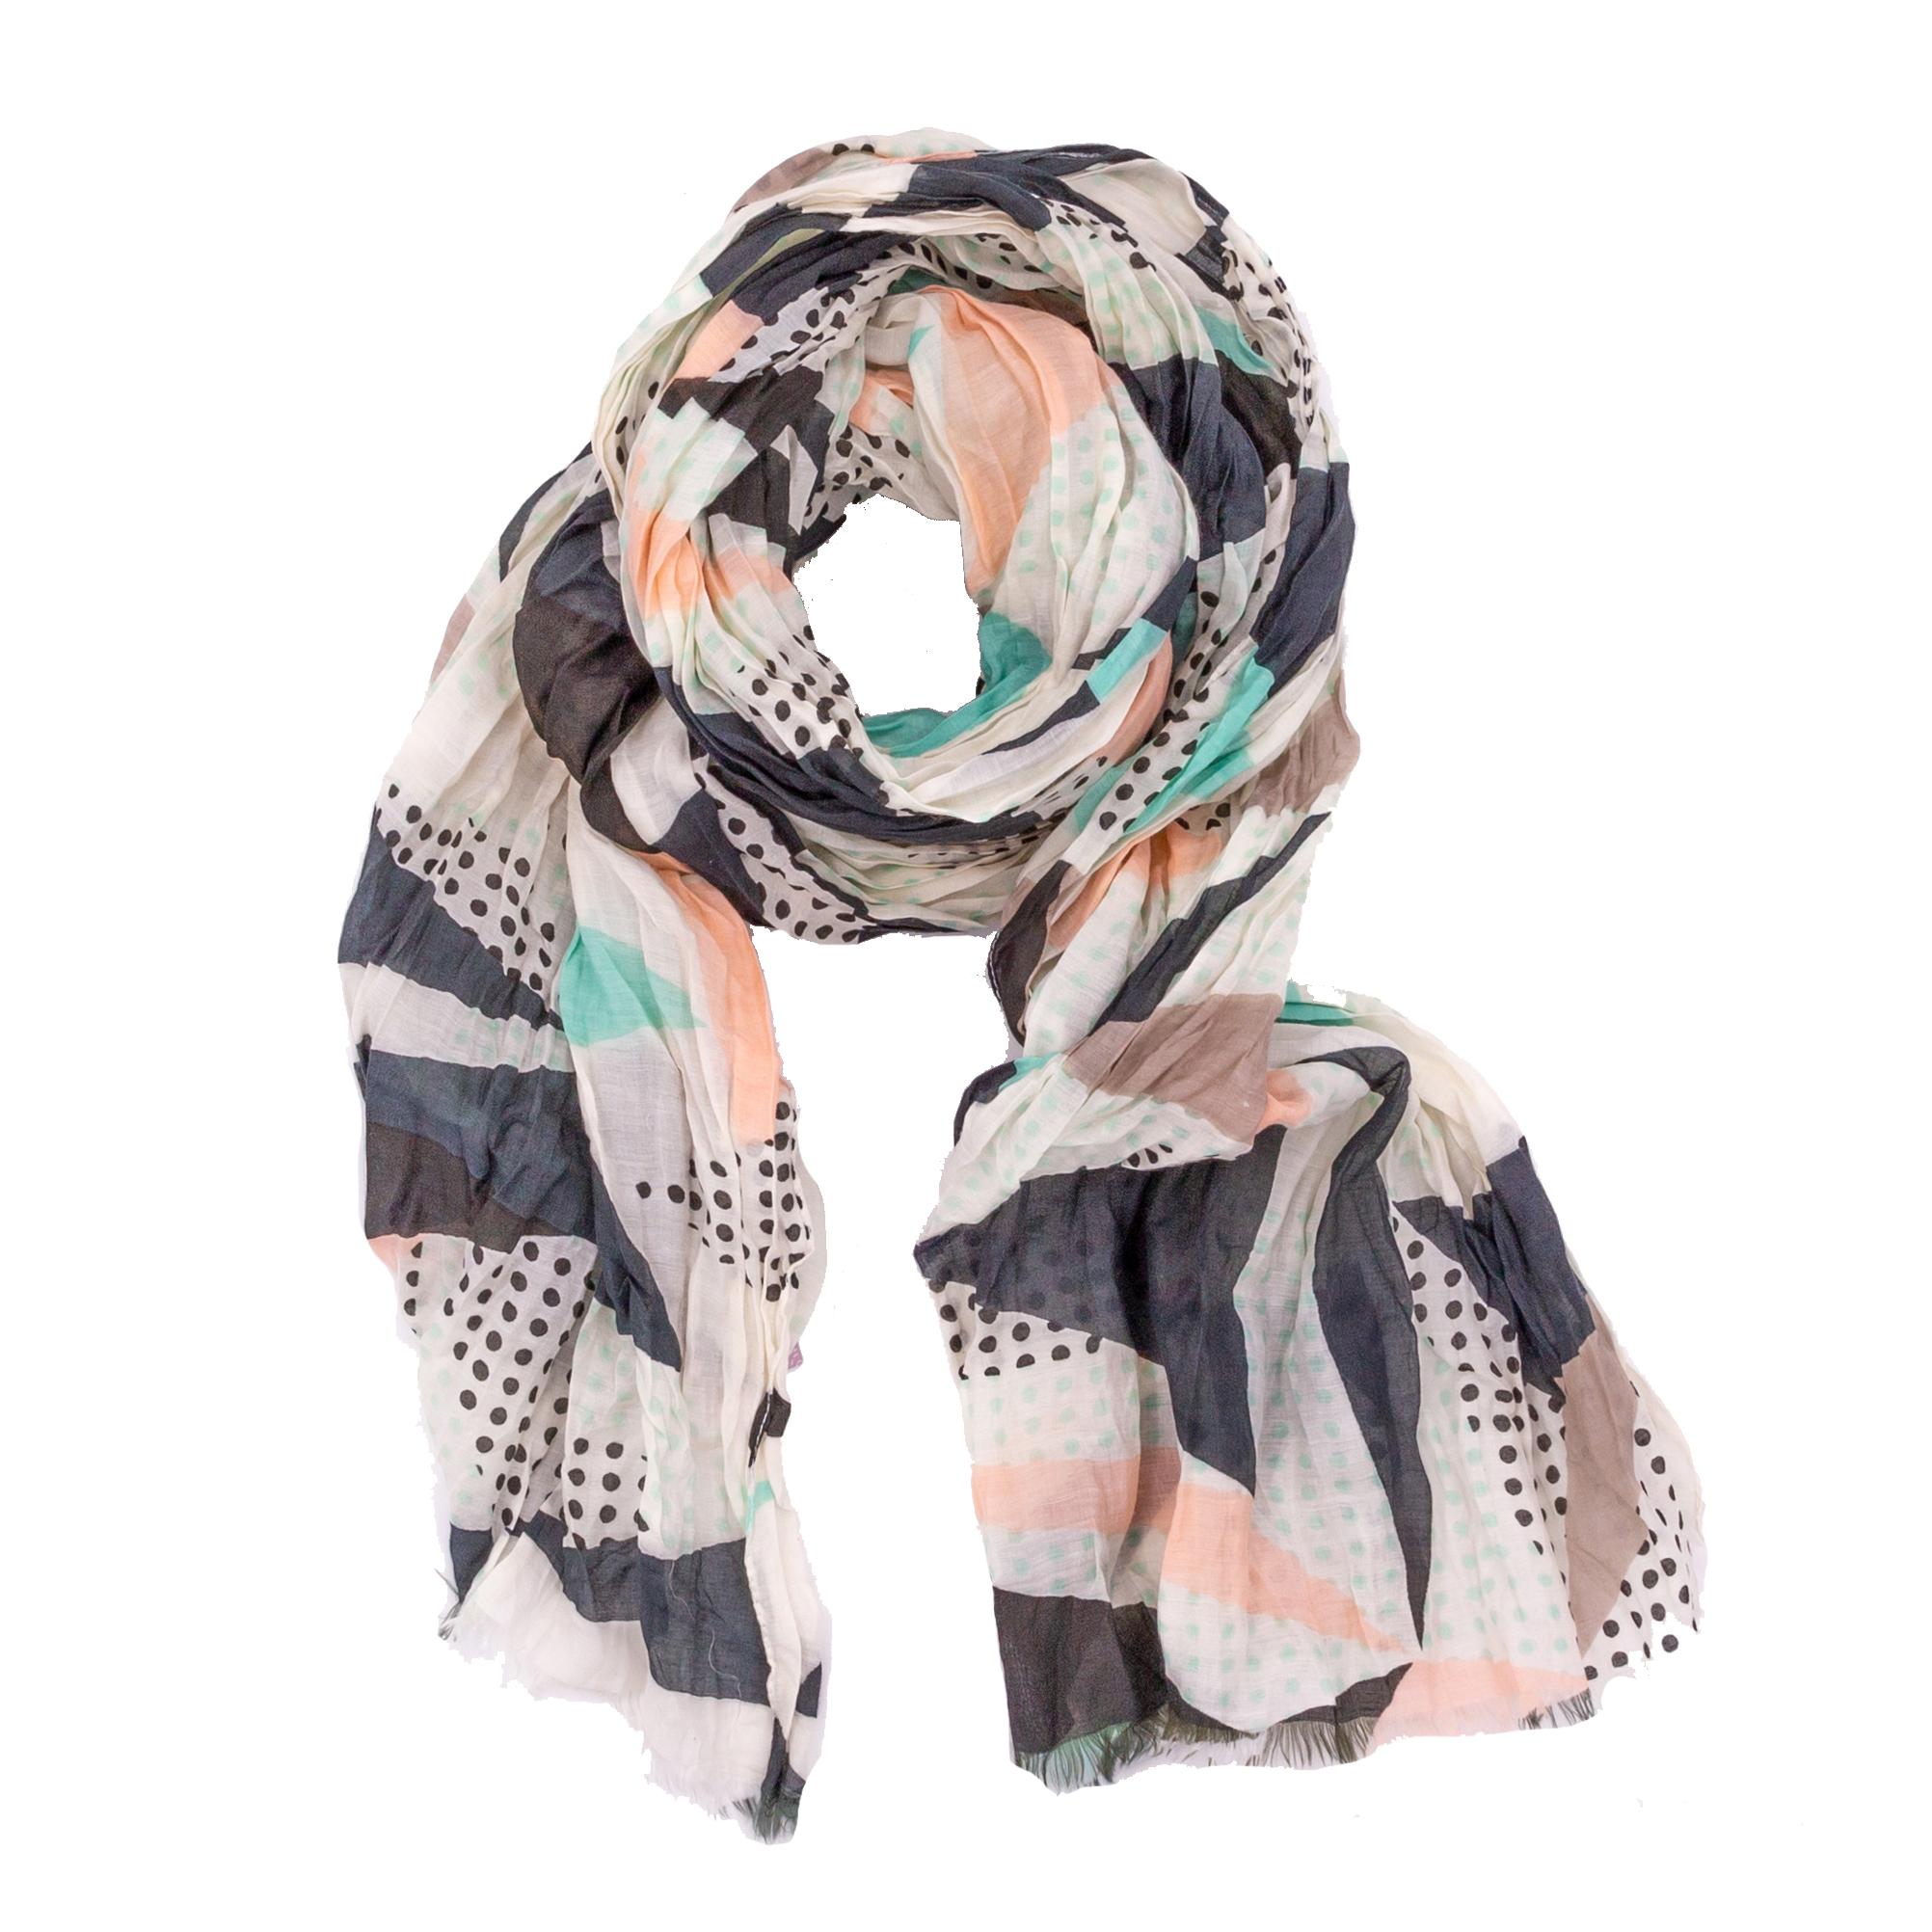 Halstuch | Schal - Muster - rosa/mint/schwarz - Yam Yam Fashion